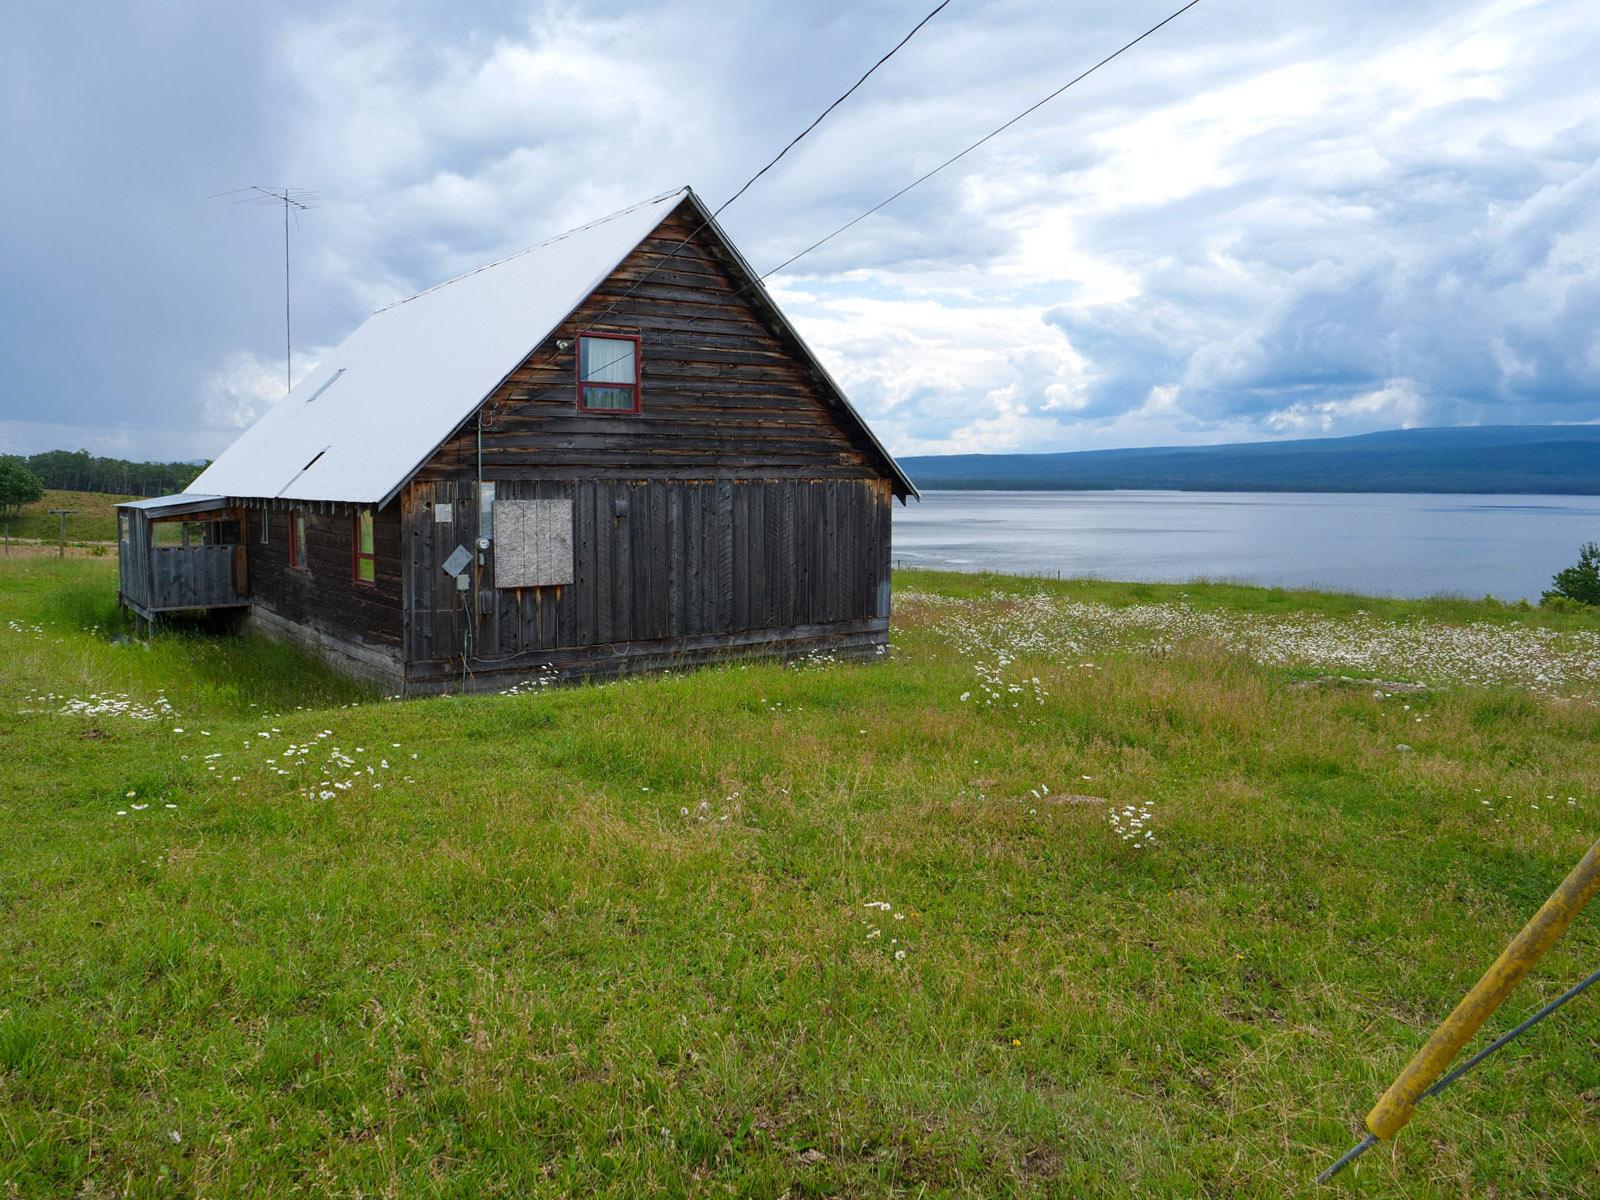 Wistaria farmland ootsa lake 09